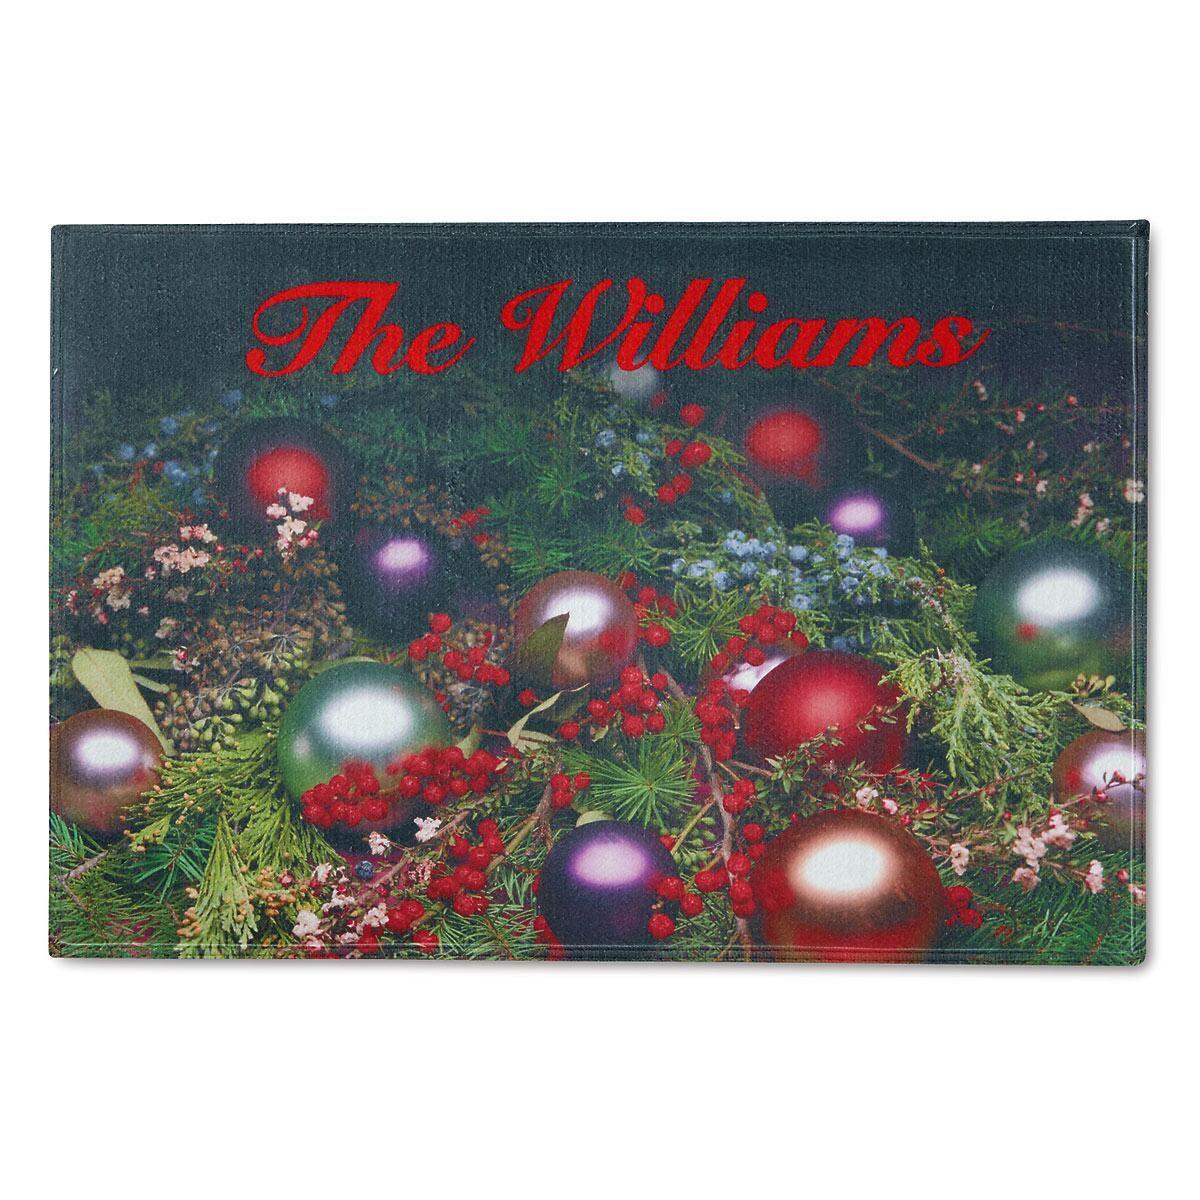 Ornaments & Pinecones Personalized Welcome Doormat